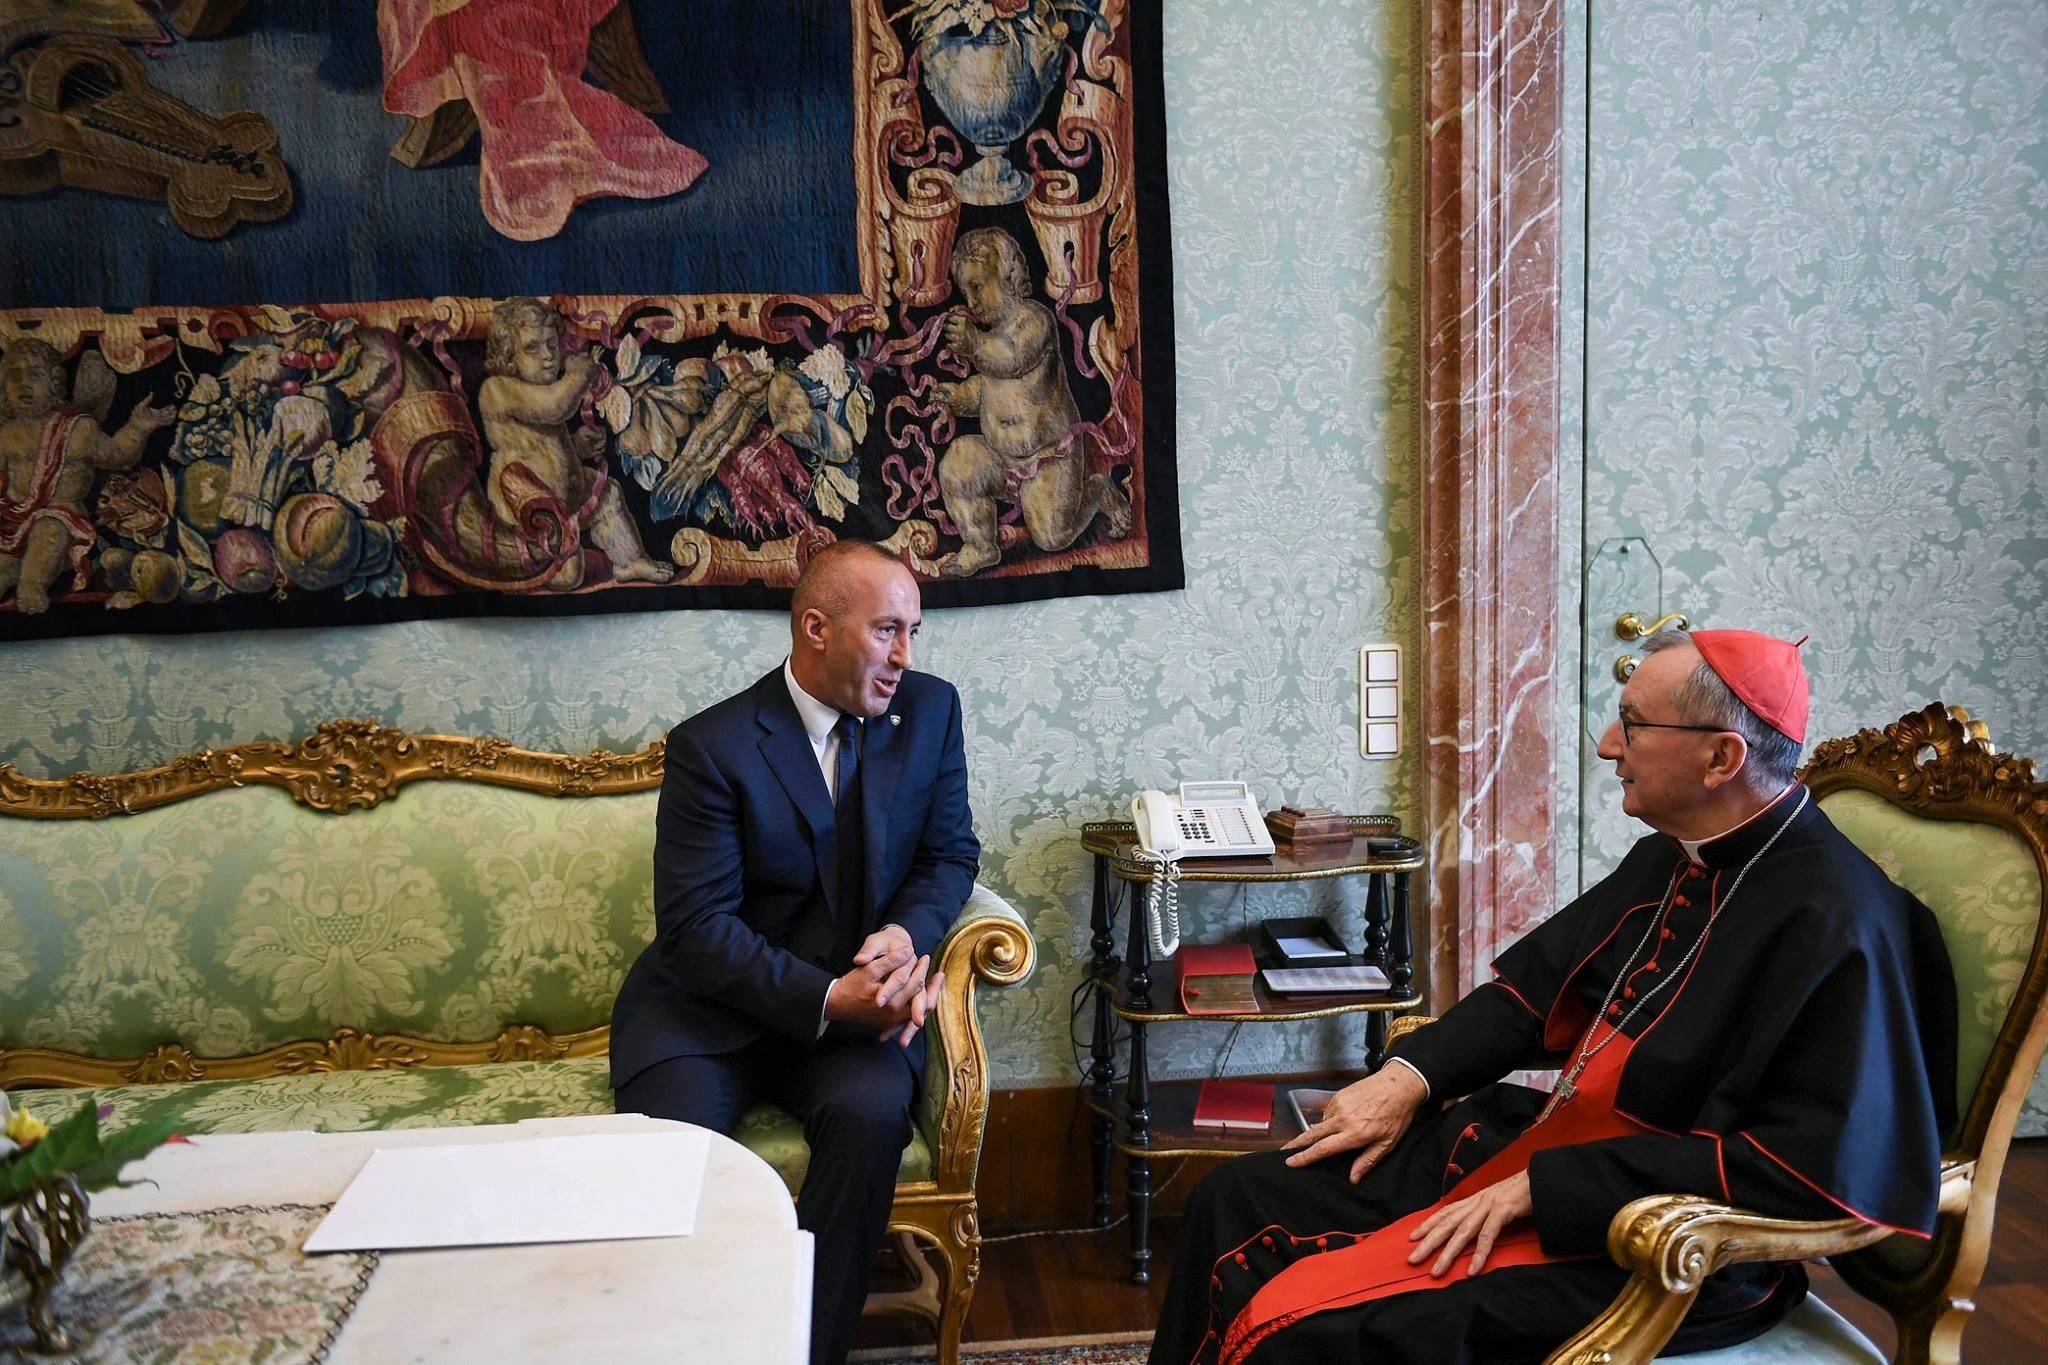 Kosovo demands Vatican's recognition